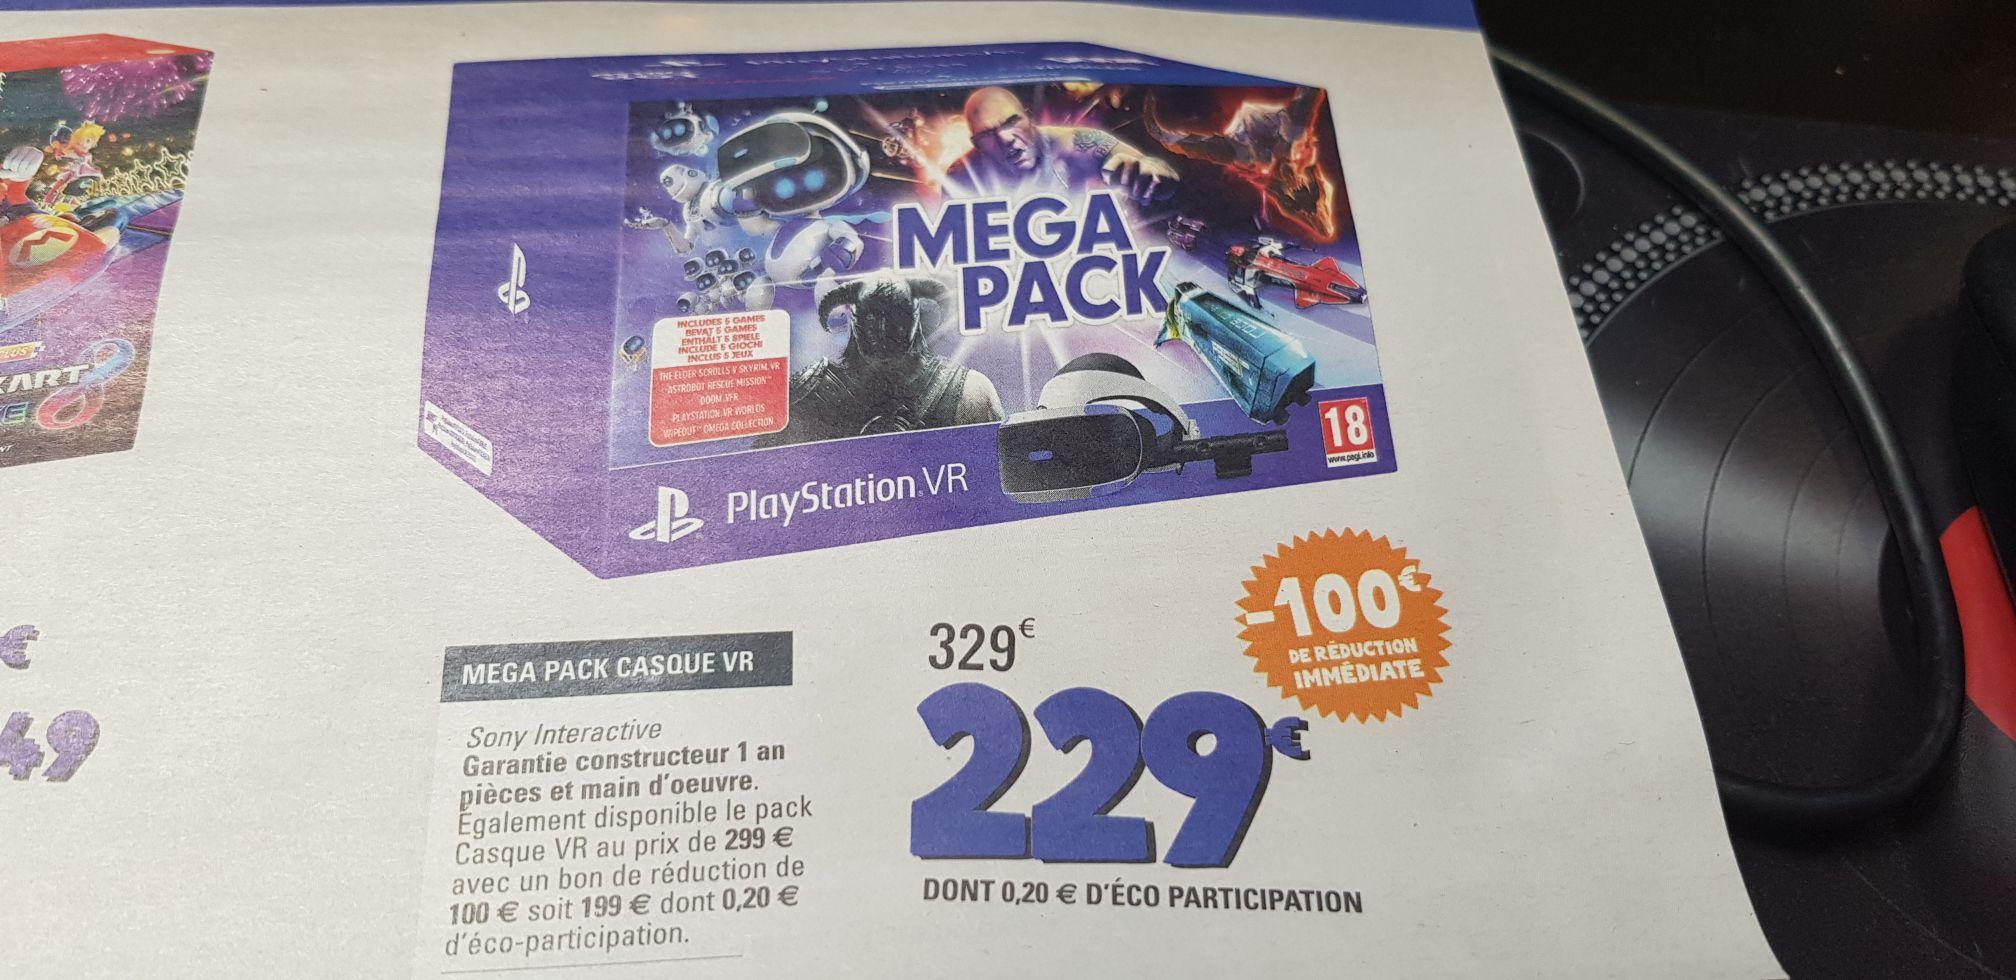 Méga Pack PlayStation VR V2 MK4 + Caméra + 5 Jeux : VR Worlds + Skyrim + Doom VFR + WipEout OC + Astro Bot RM (Dématérialisé)